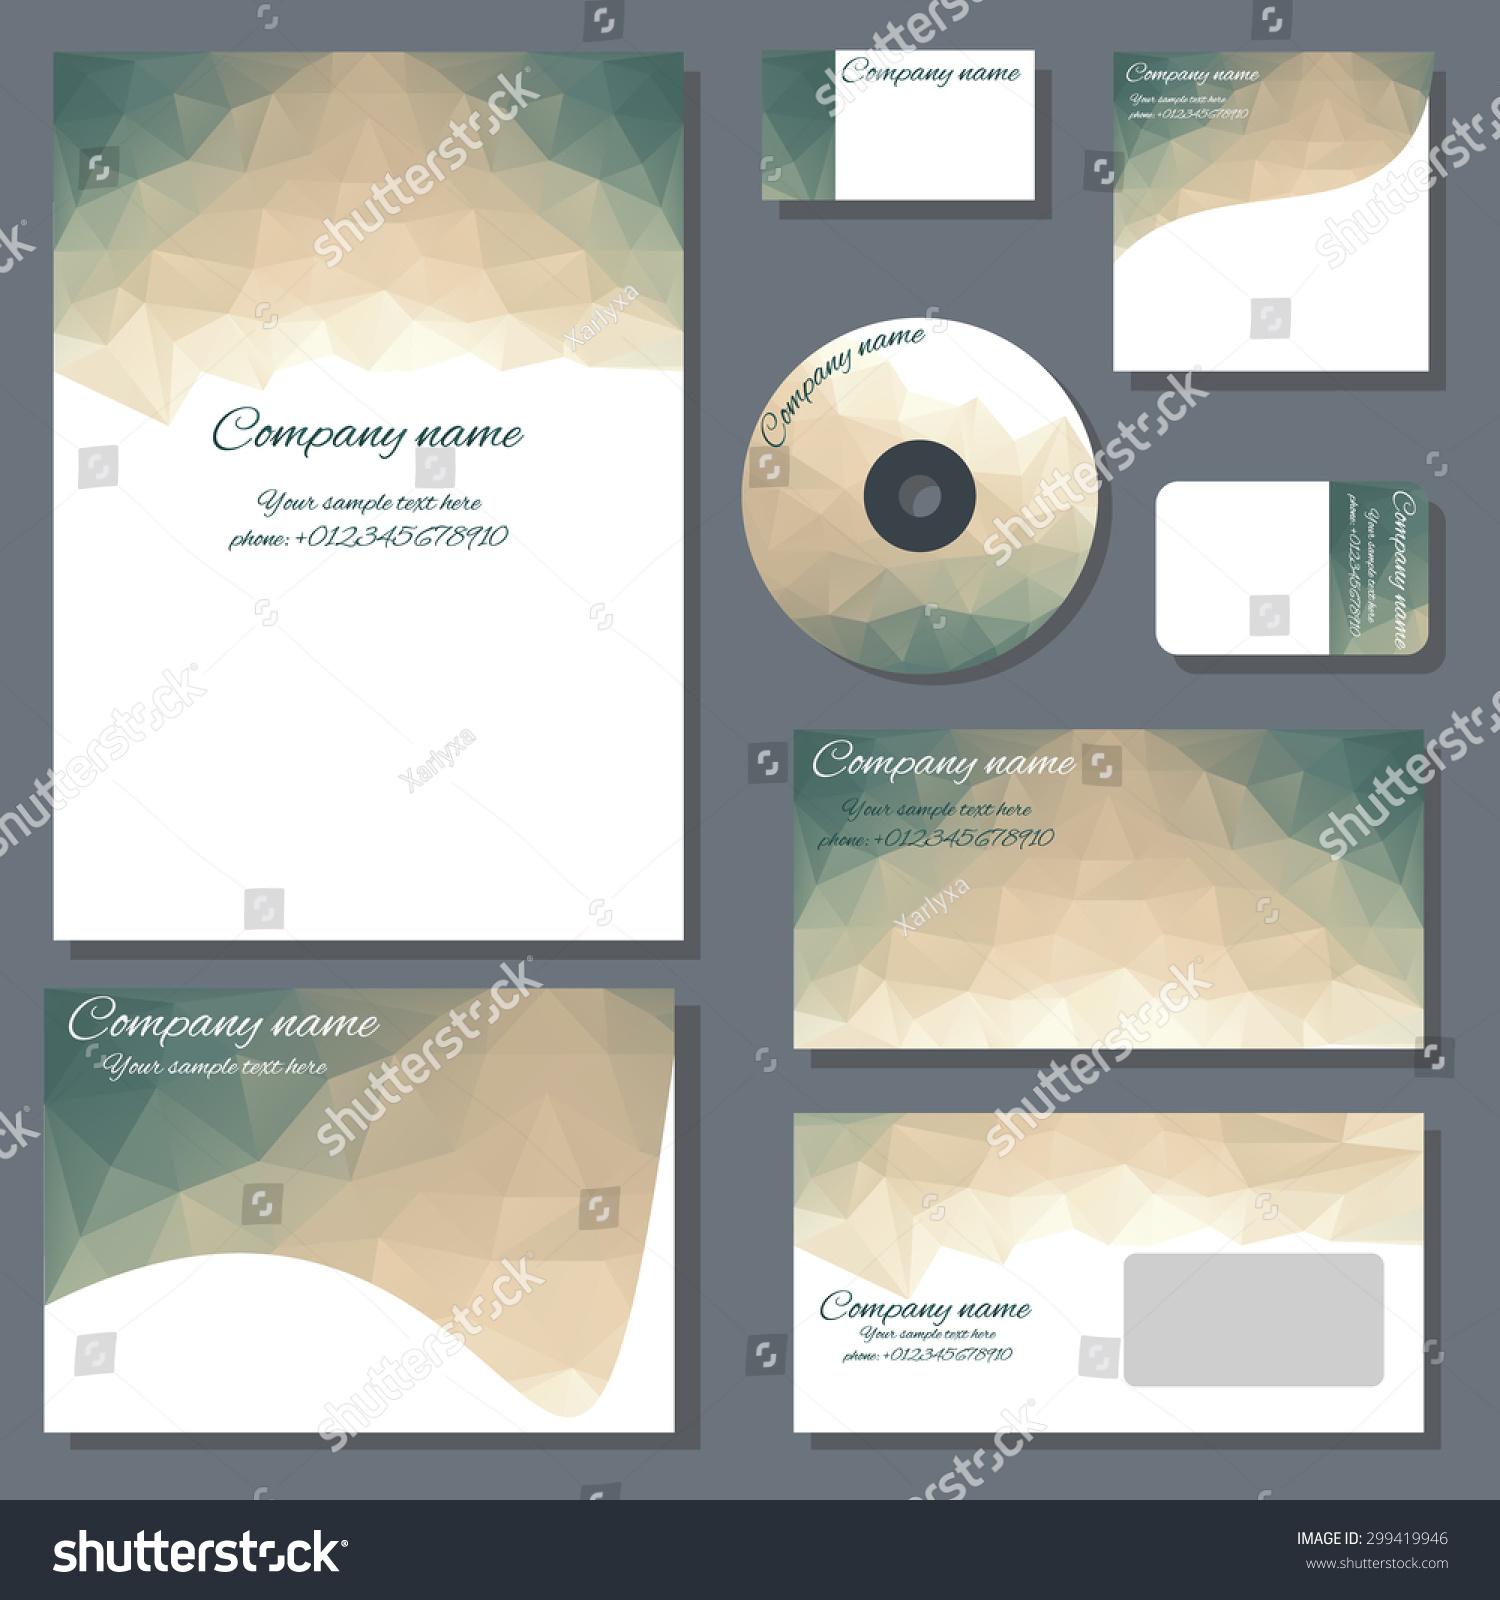 Set templates cd disks envelopes notebooks stock vector 299419946 set templates cd disks envelopes notebooks stock vector 299419946 shutterstock stopboris Images